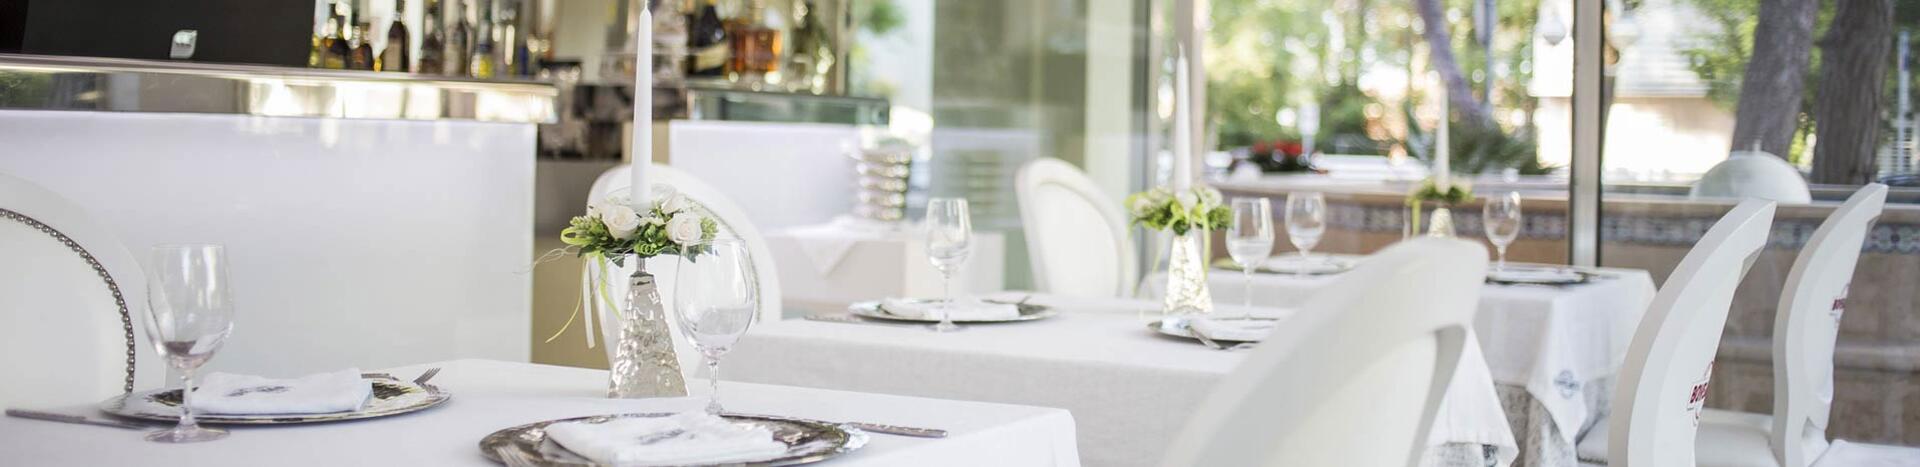 hotelparadisomilanomarittima en restaurant 001